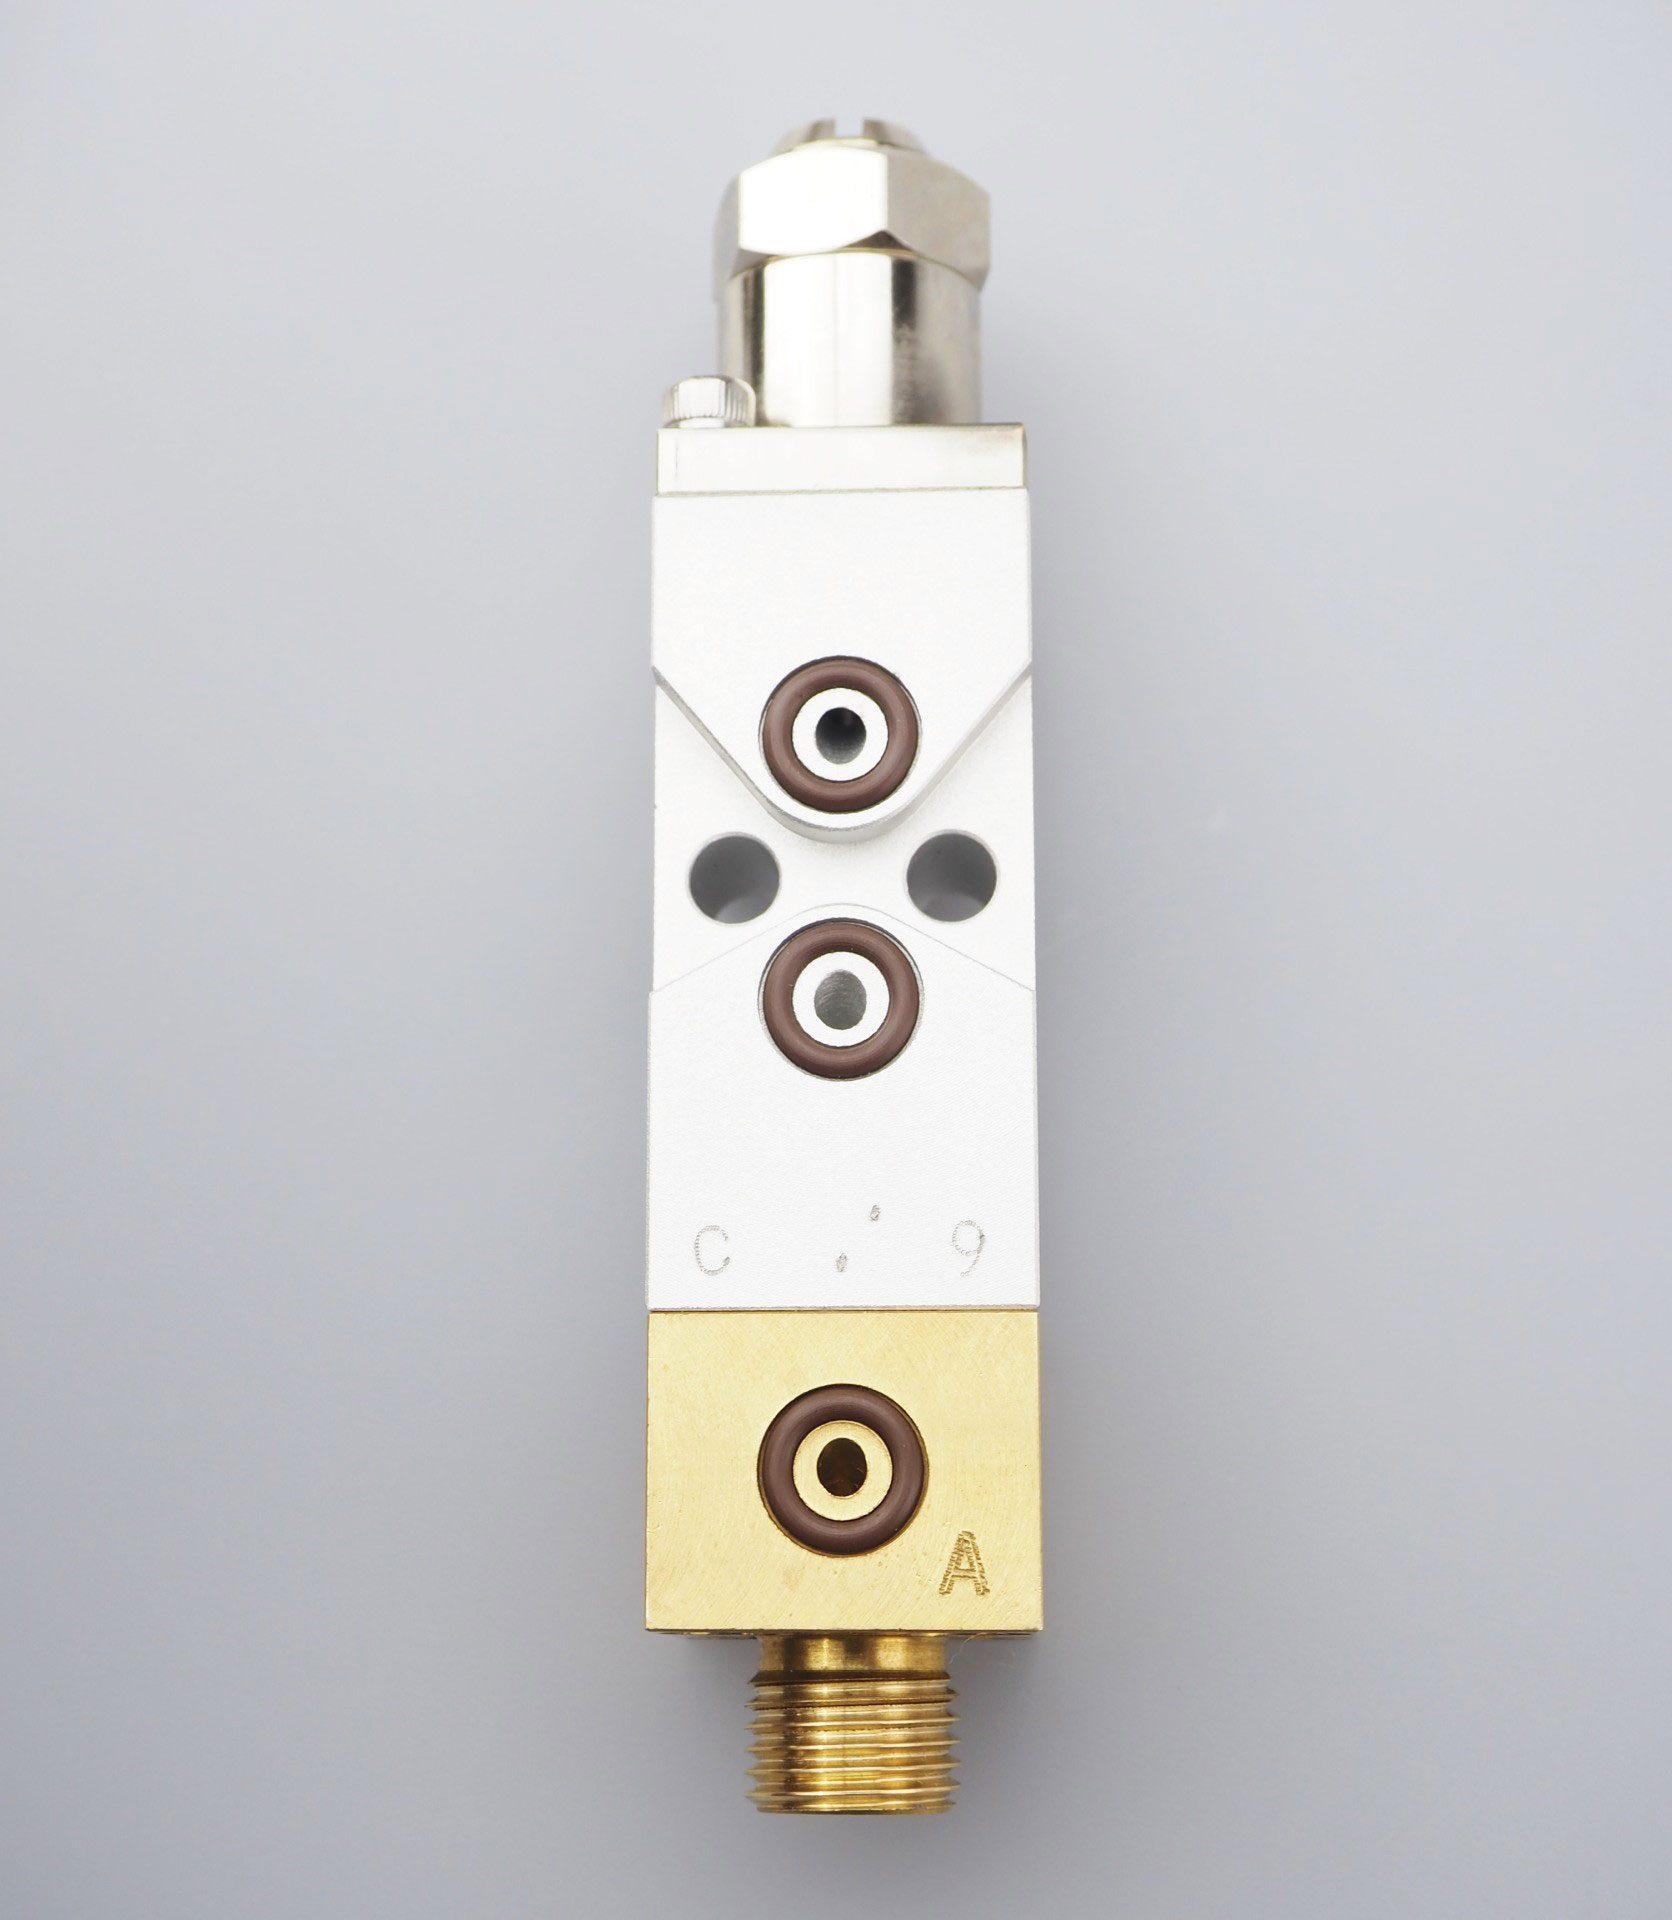 Swirl Pattern Adhesive Spray Compatible Crafers Swirl Module